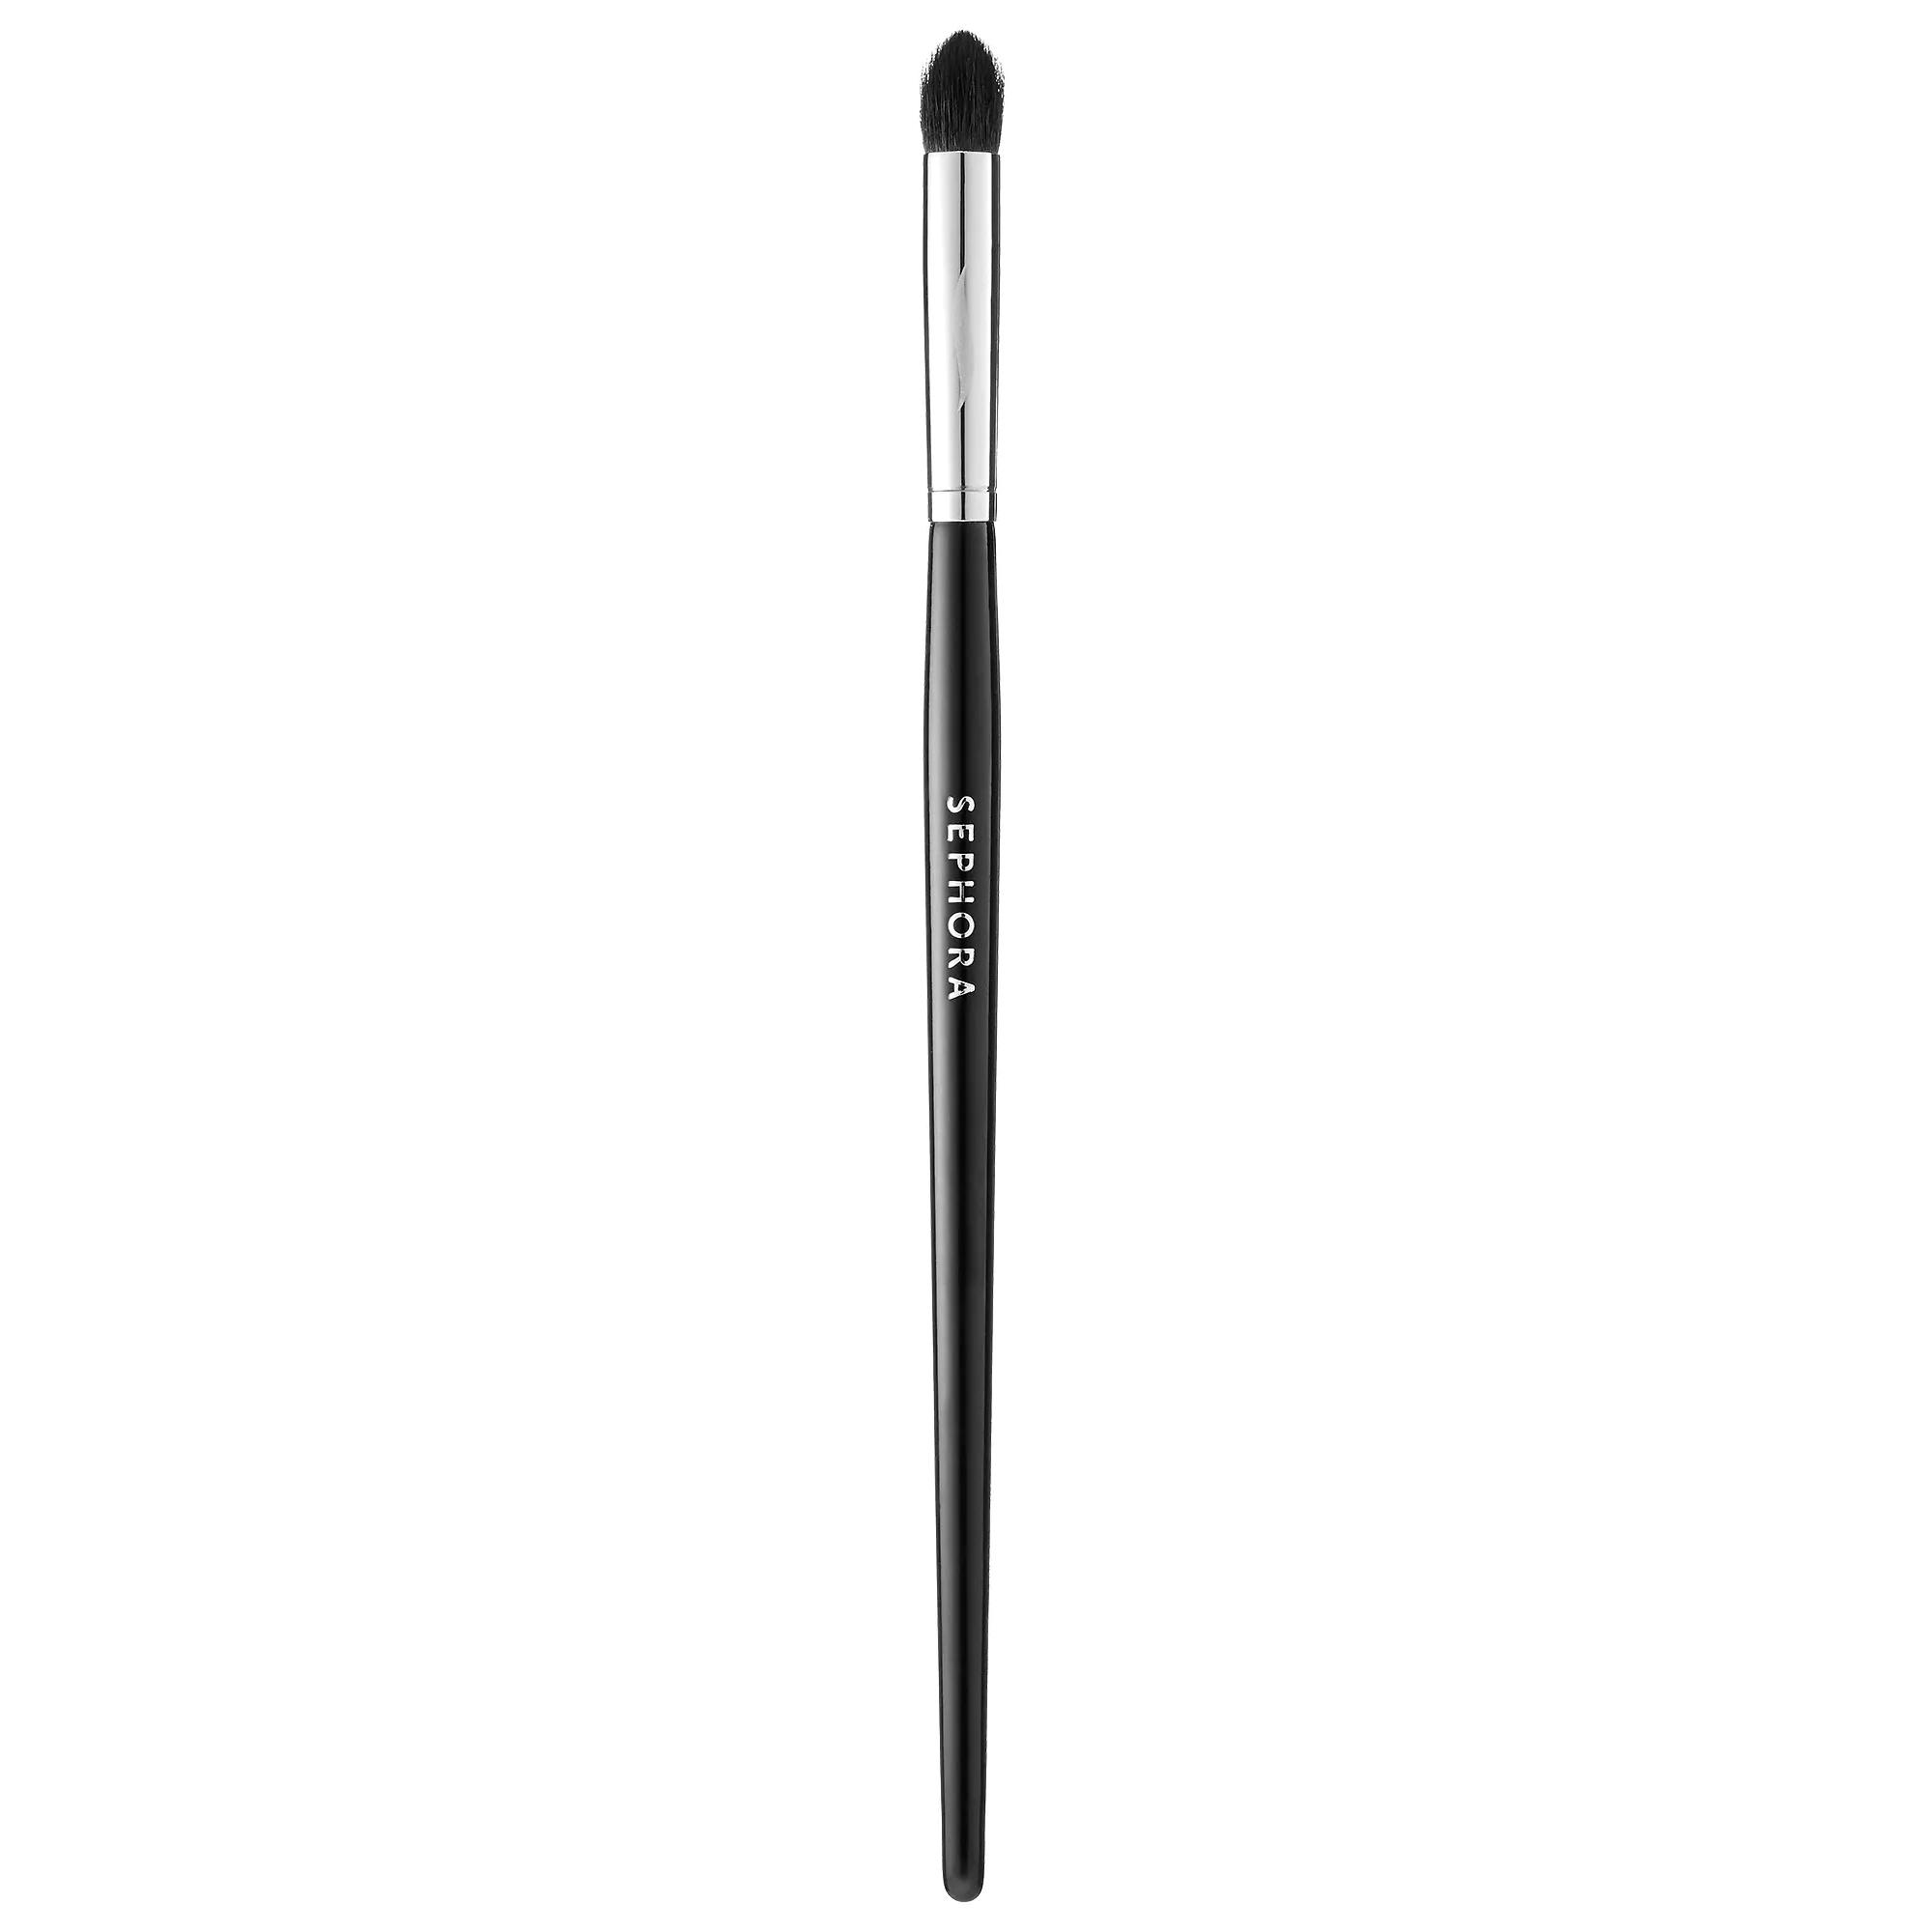 Sephora PRO Bullet Crease Brush 86